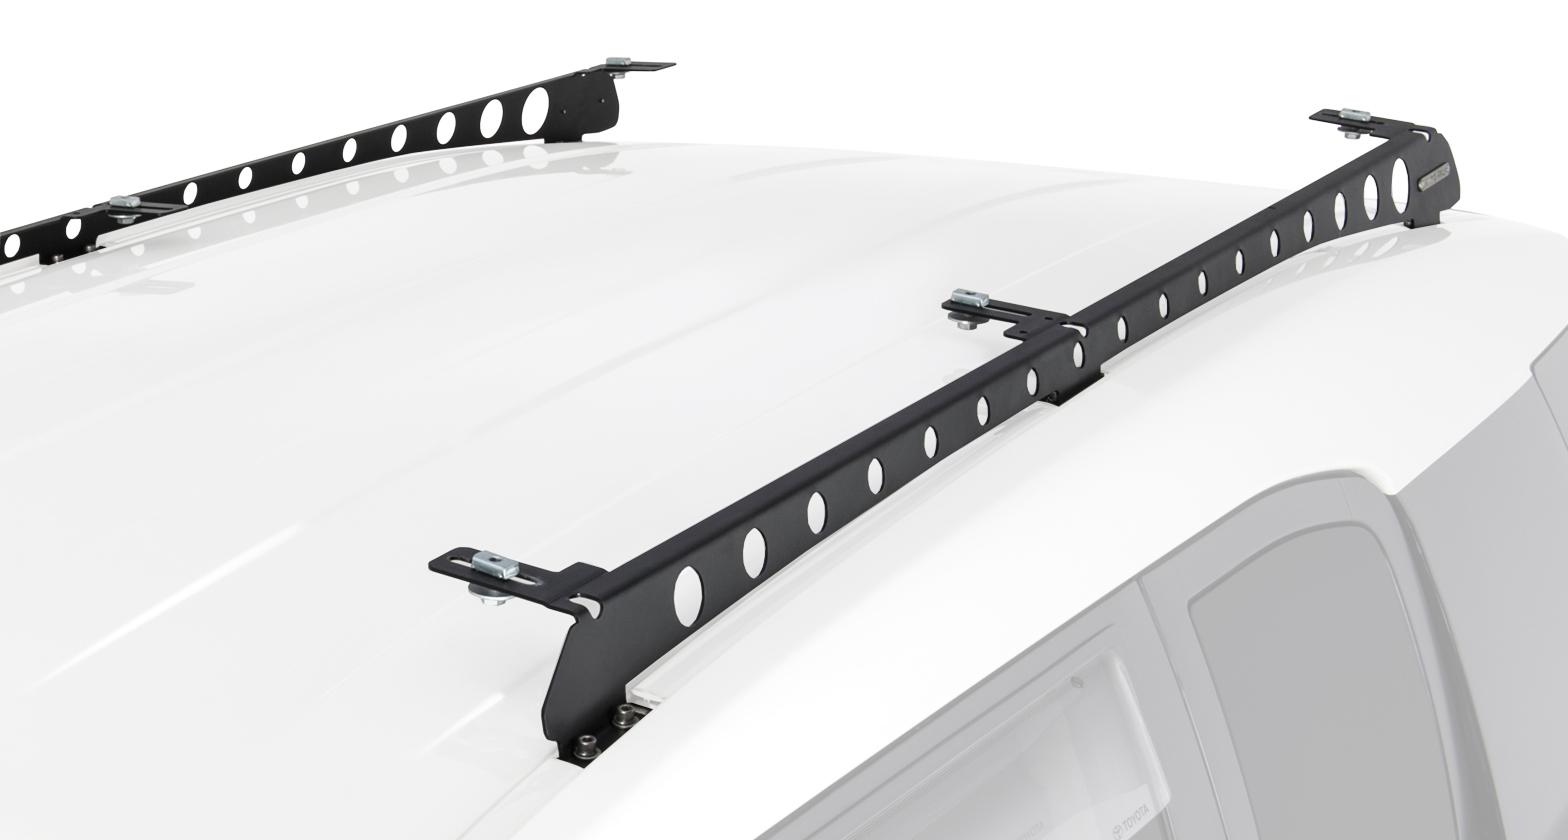 Rvab1 Rhino Rack Backbone 2 Base Mounting System